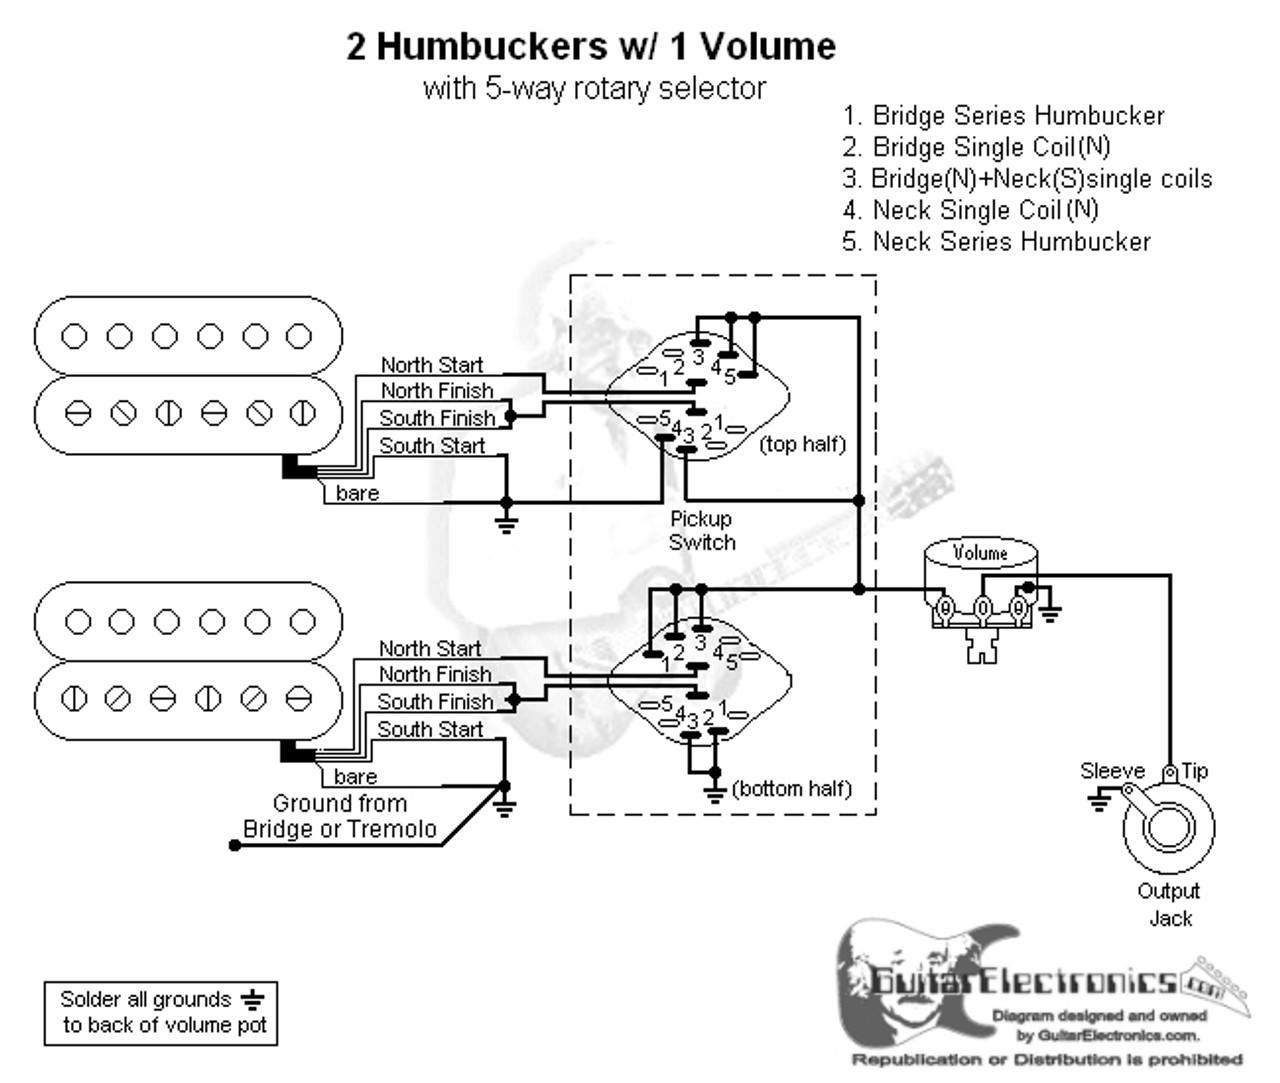 2 humbuckers 5 way rotary switch 1 volume 01 5 way switch wiring diagram leviton 5 way rotary switch wiring diagram [ 1280 x 1083 Pixel ]